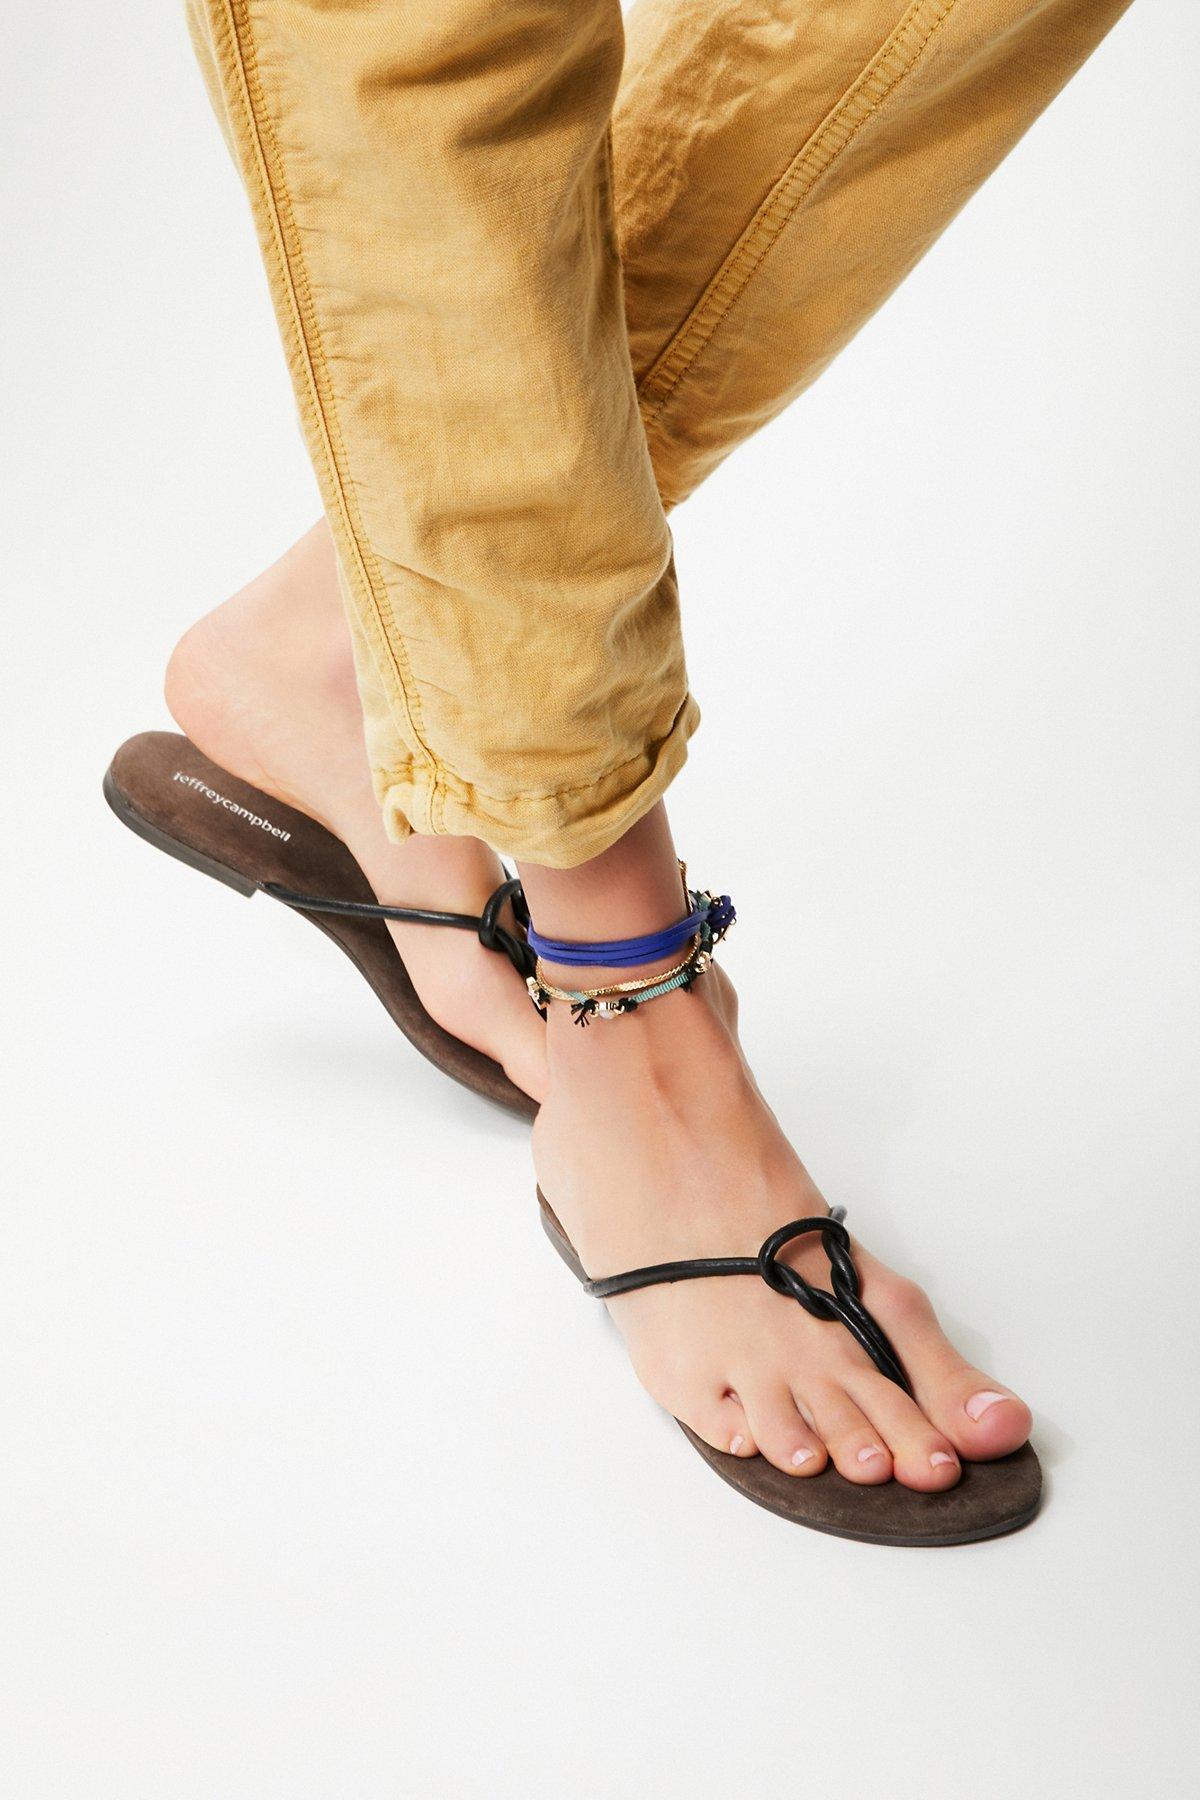 Malia懒人凉鞋